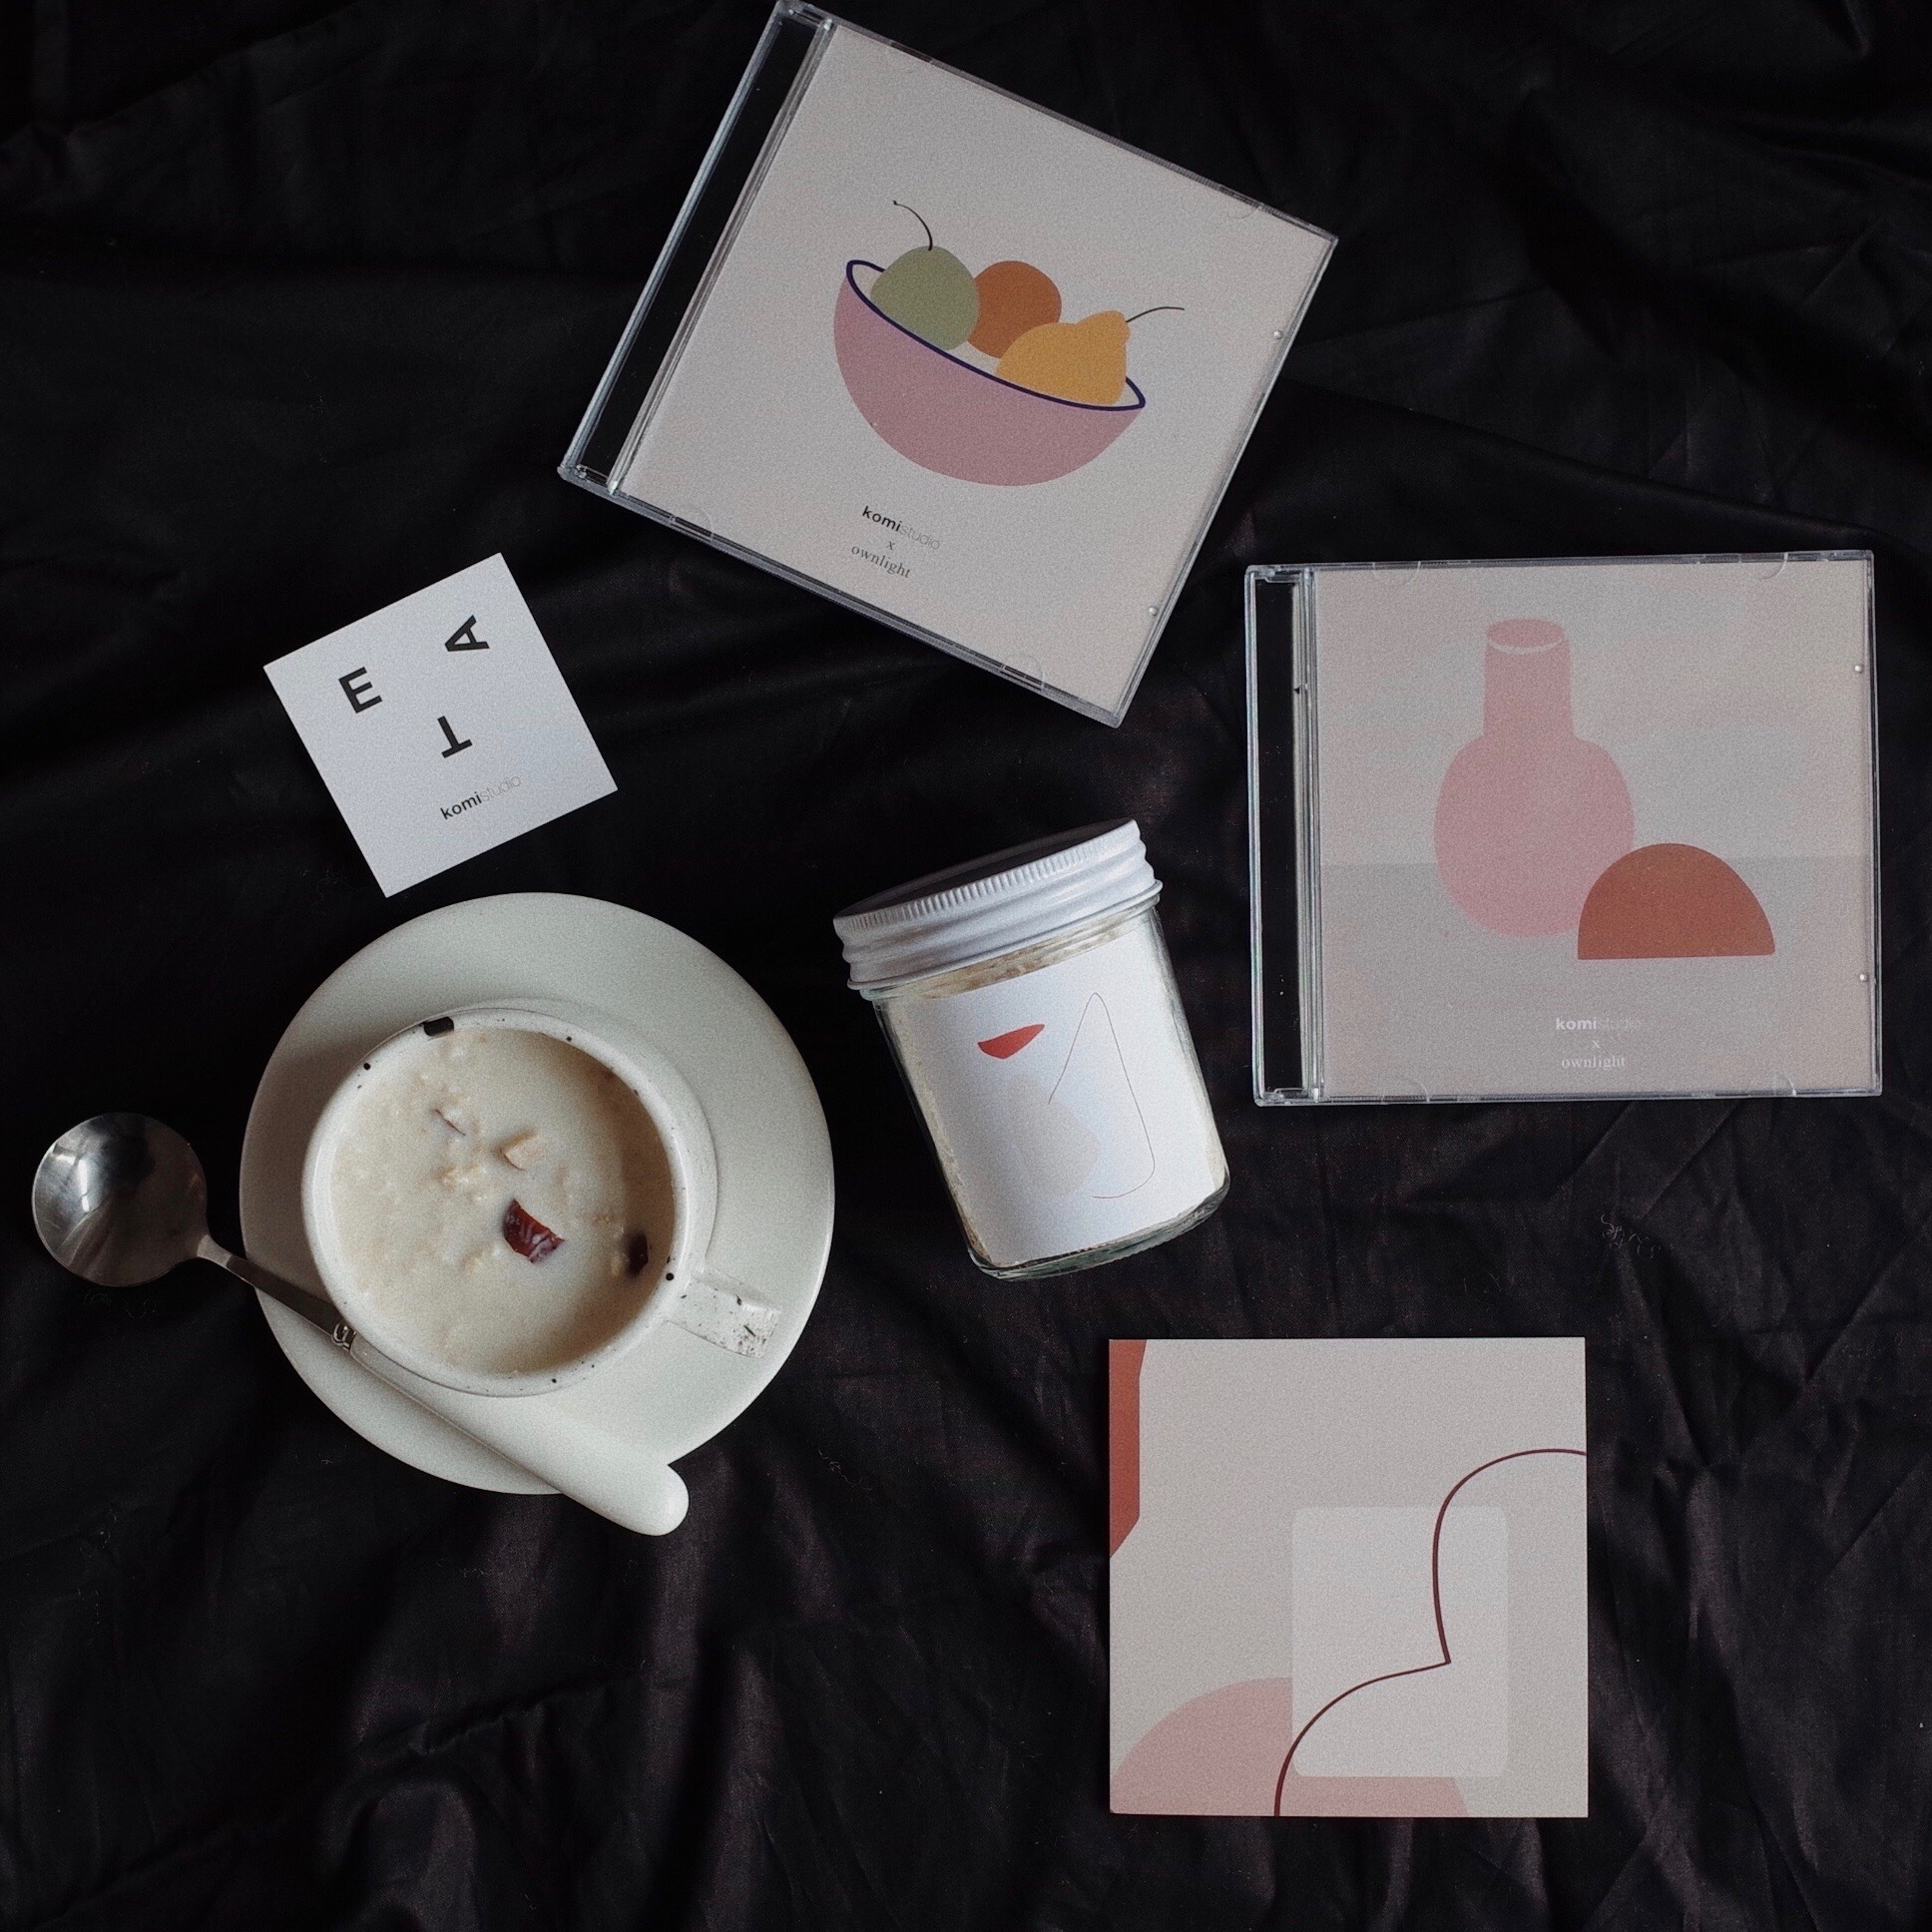 komistudio CD手工巧克力ownlight合作款礼盒顺丰包邮